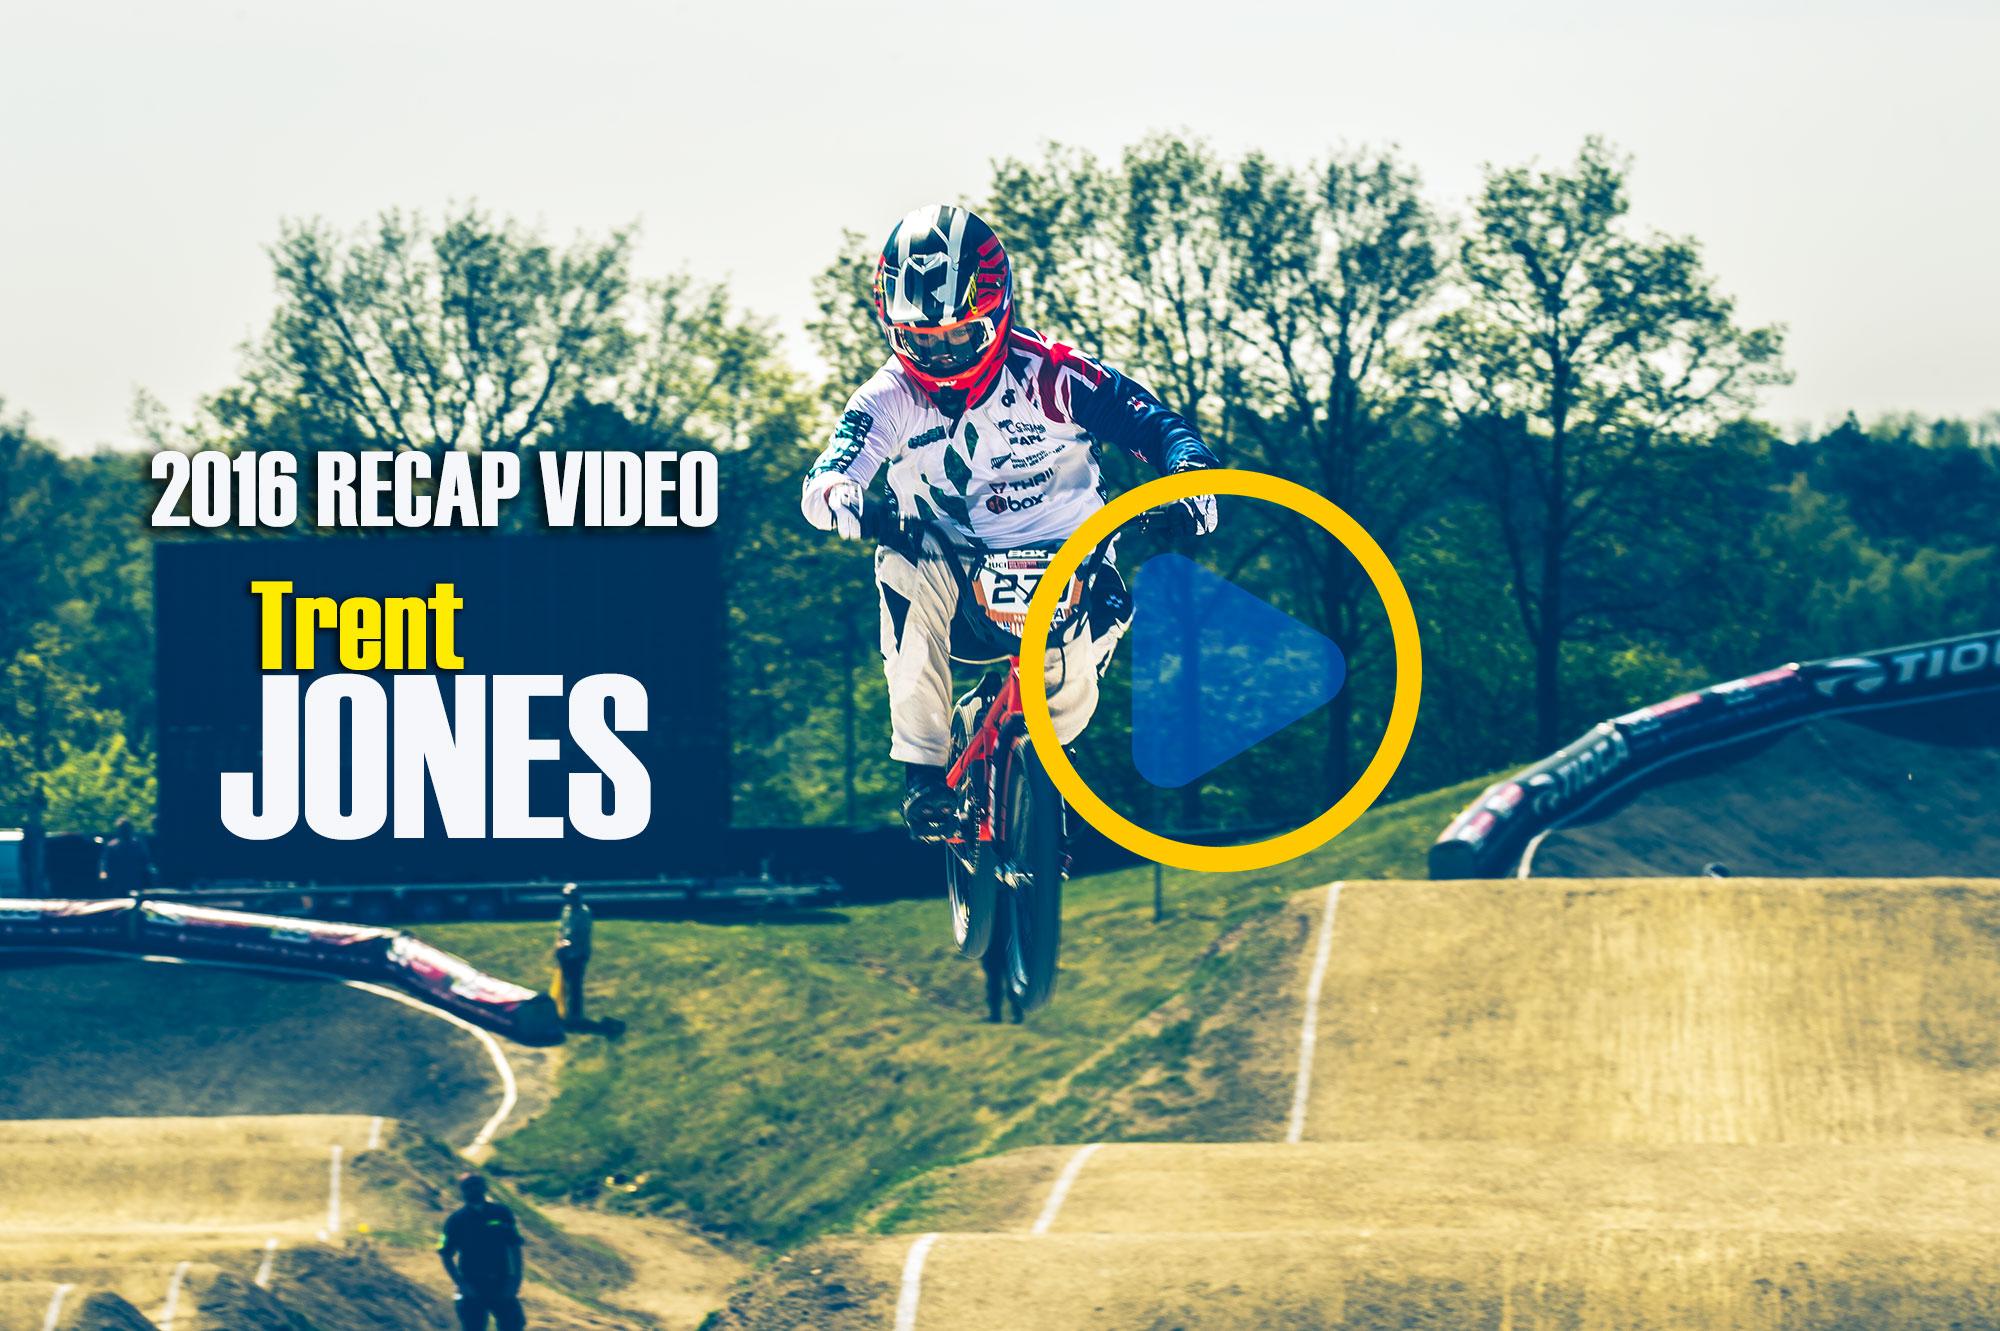 Vidéo récap 2016 TRENT JONES